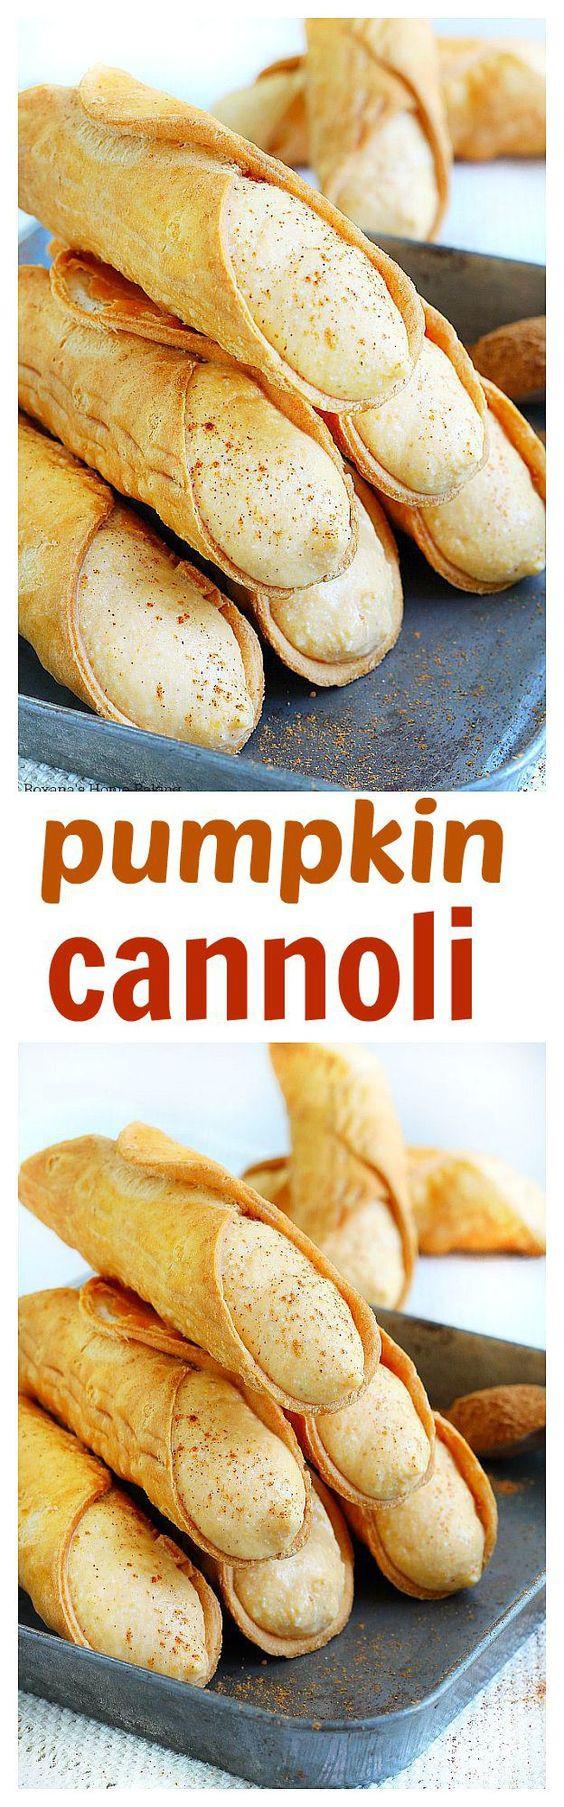 Italian Thanksgiving Desserts  Cannoli Classic italian and Italian desserts on Pinterest